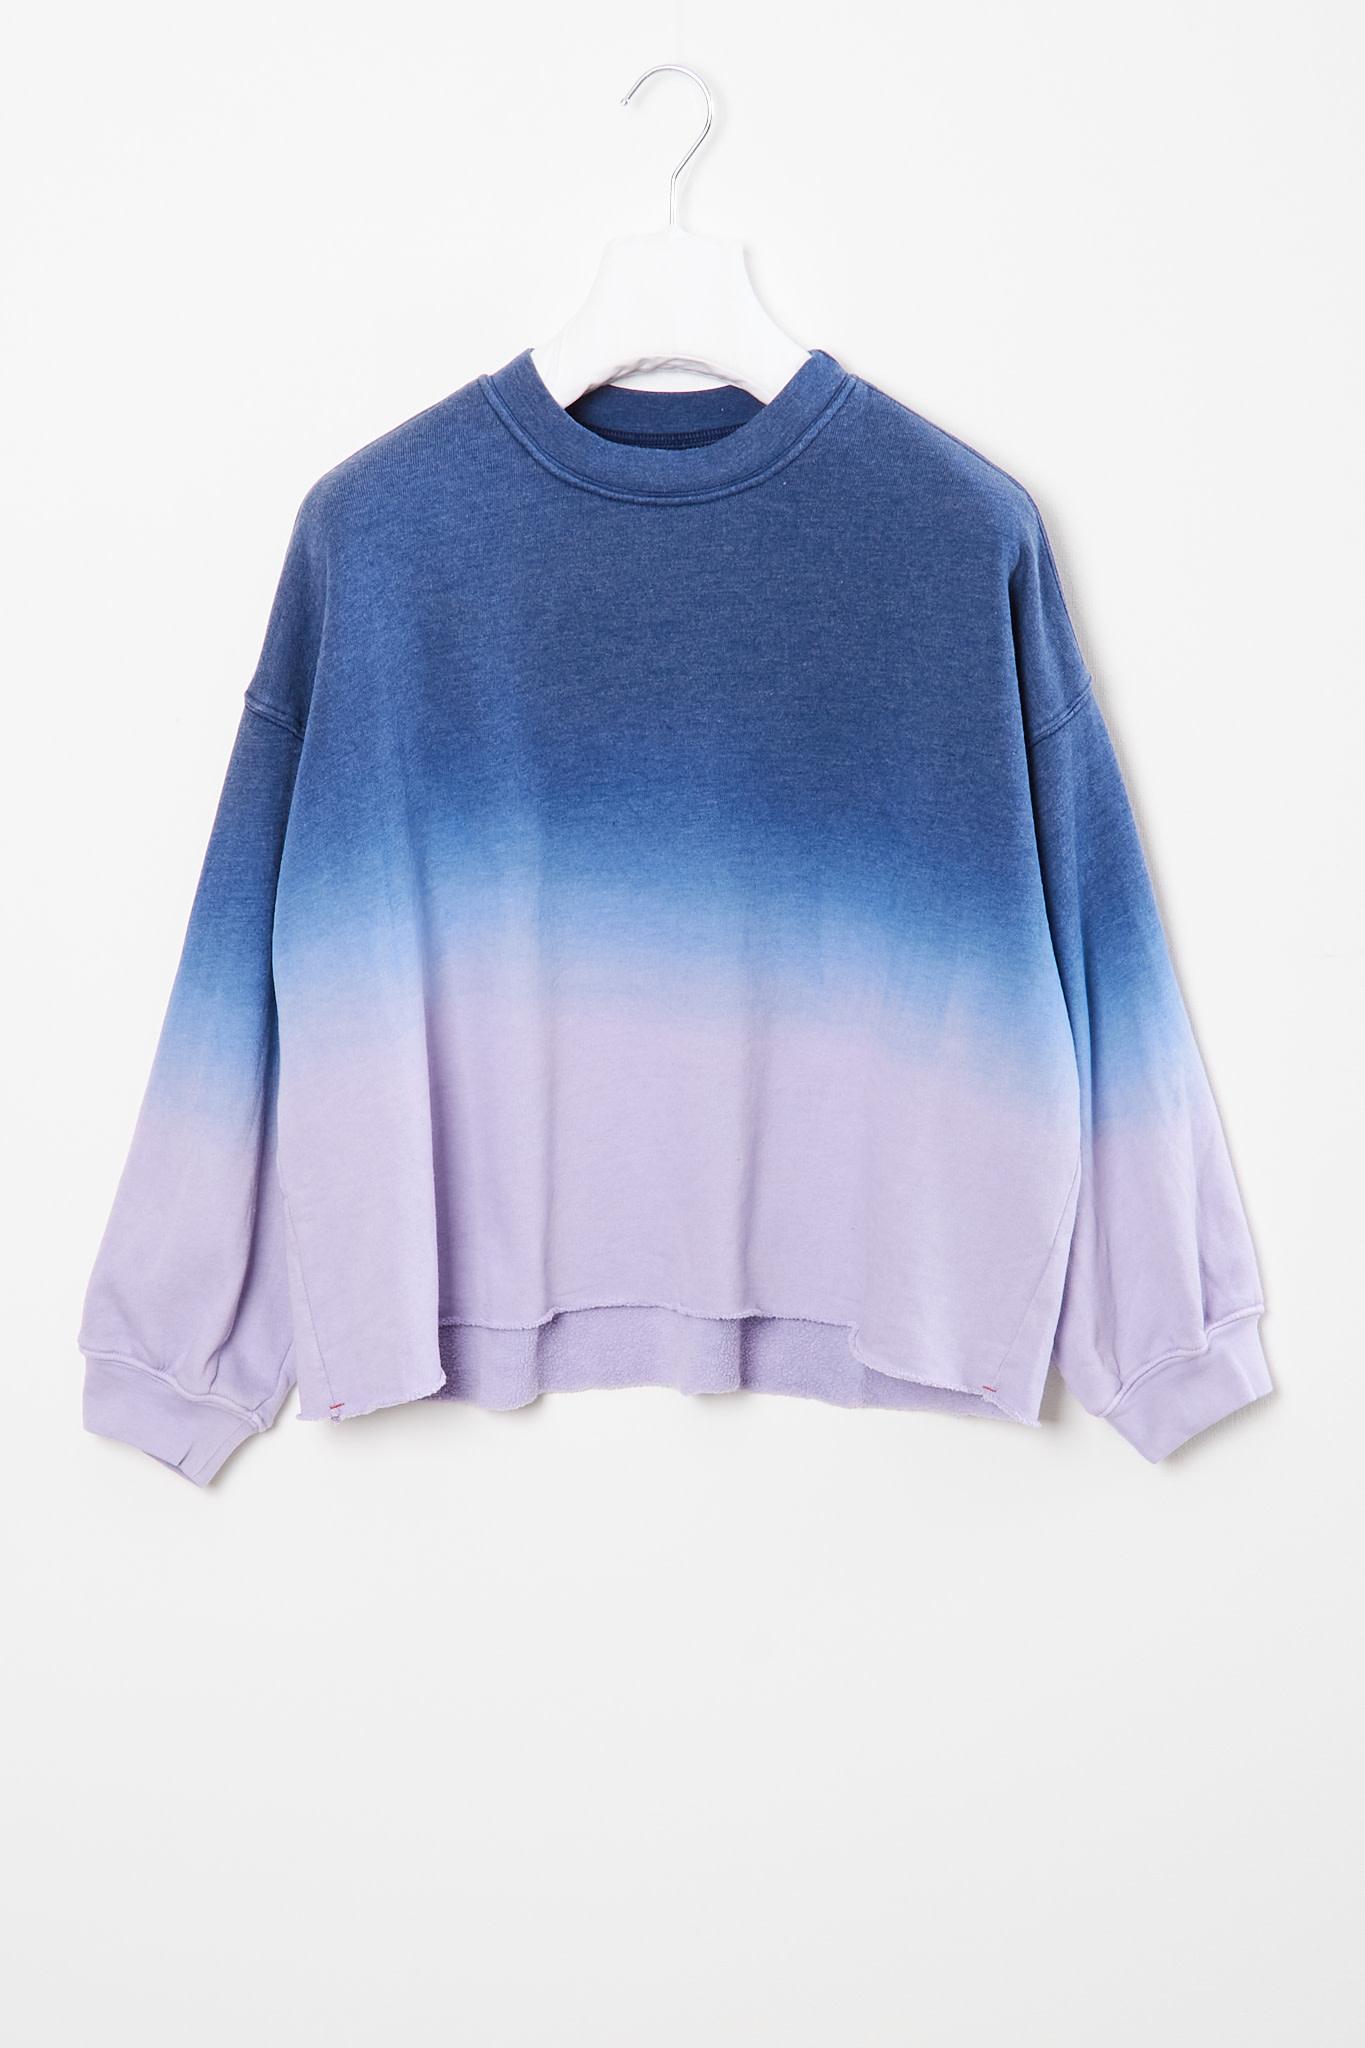 Xirena - Honor dip dye sweatshirt